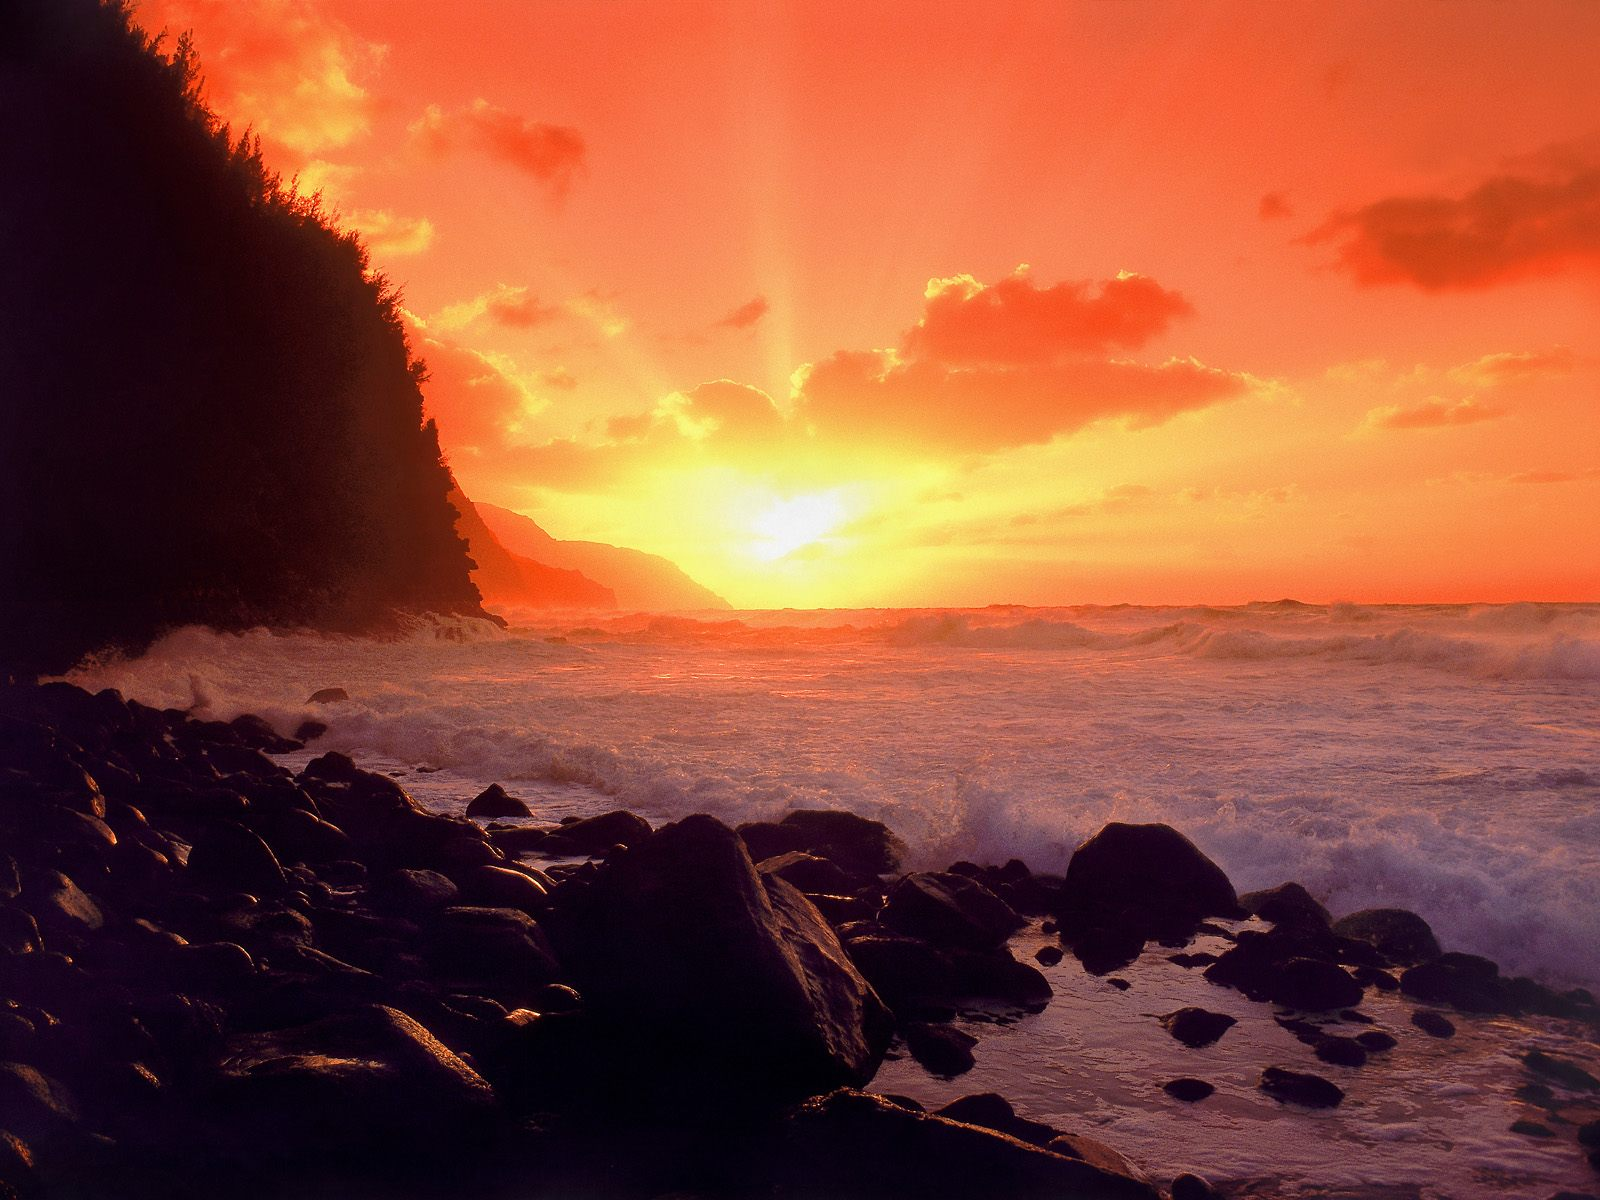 Hawaiian Sunset Wallpapers